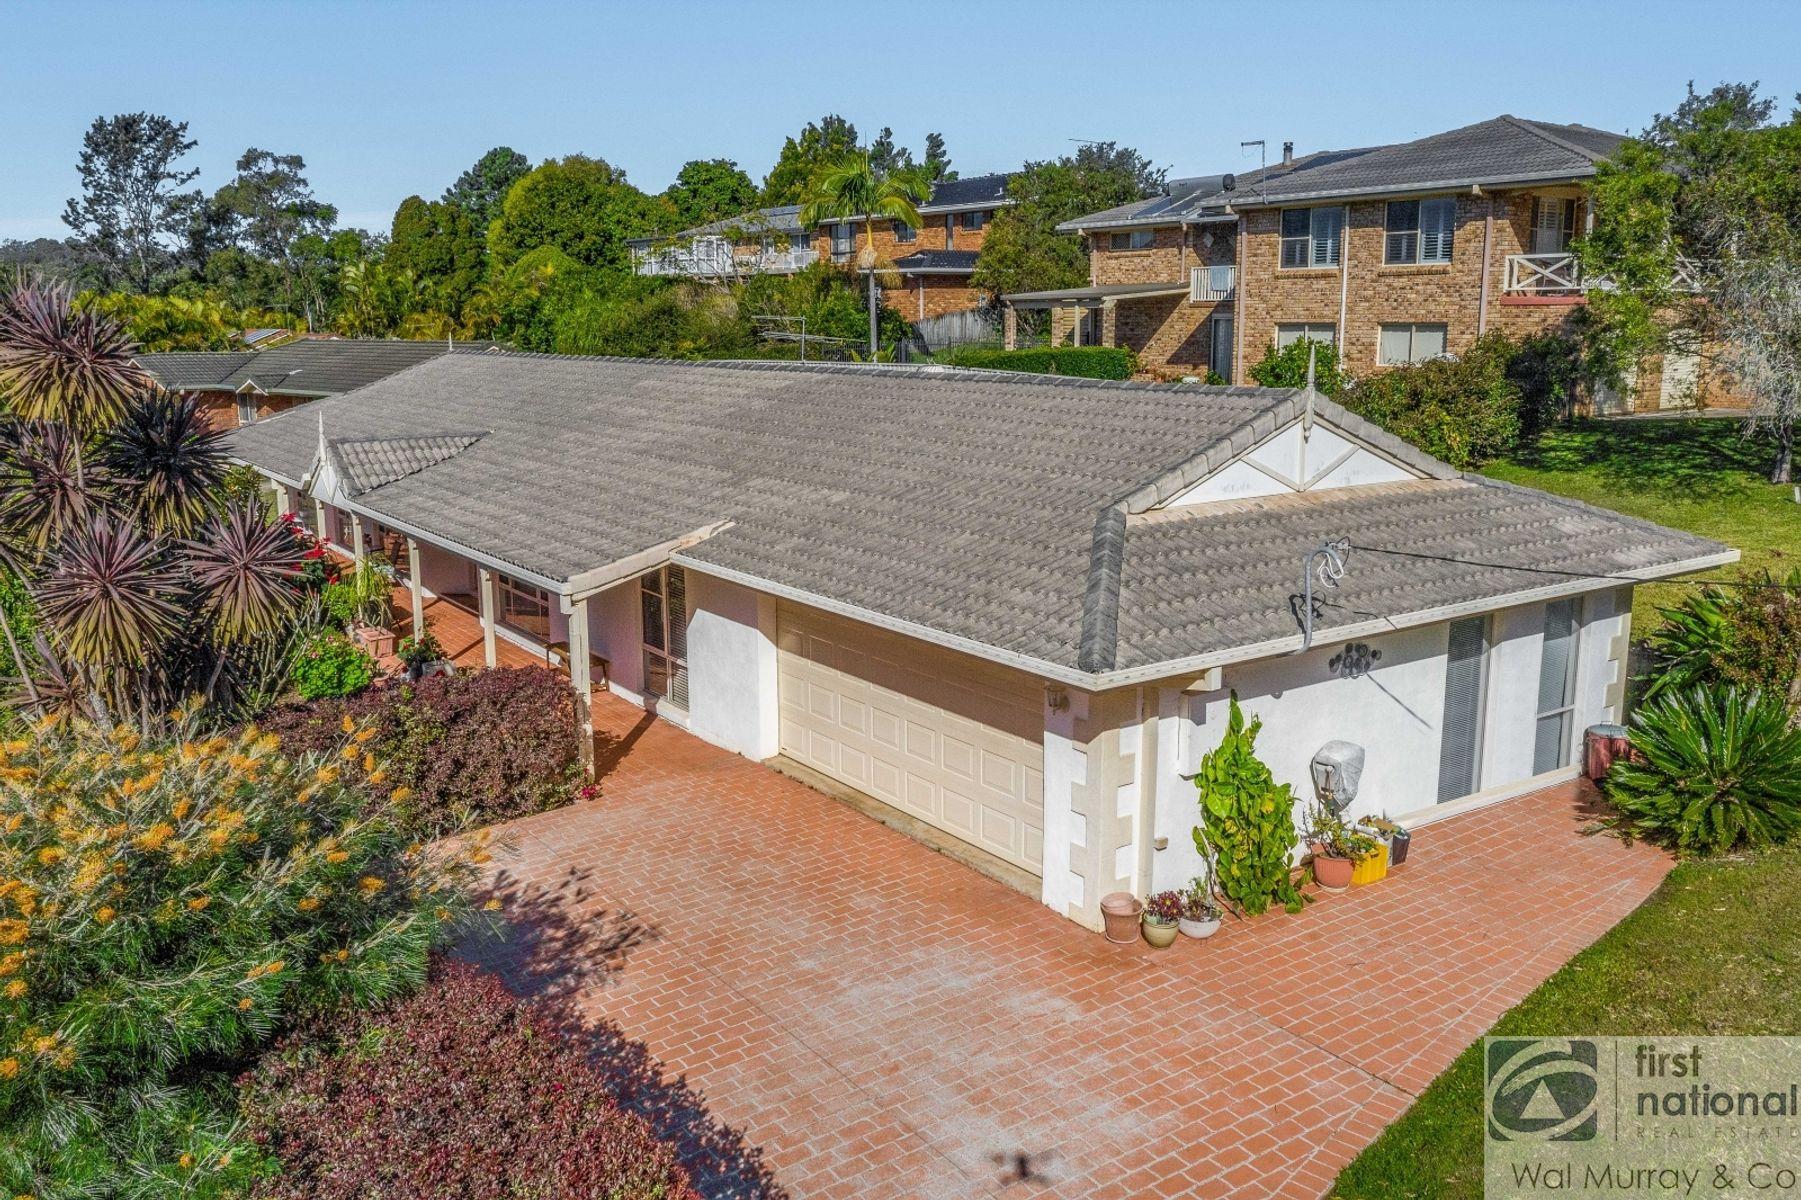 184 Invercauld Road, Goonellabah, NSW 2480